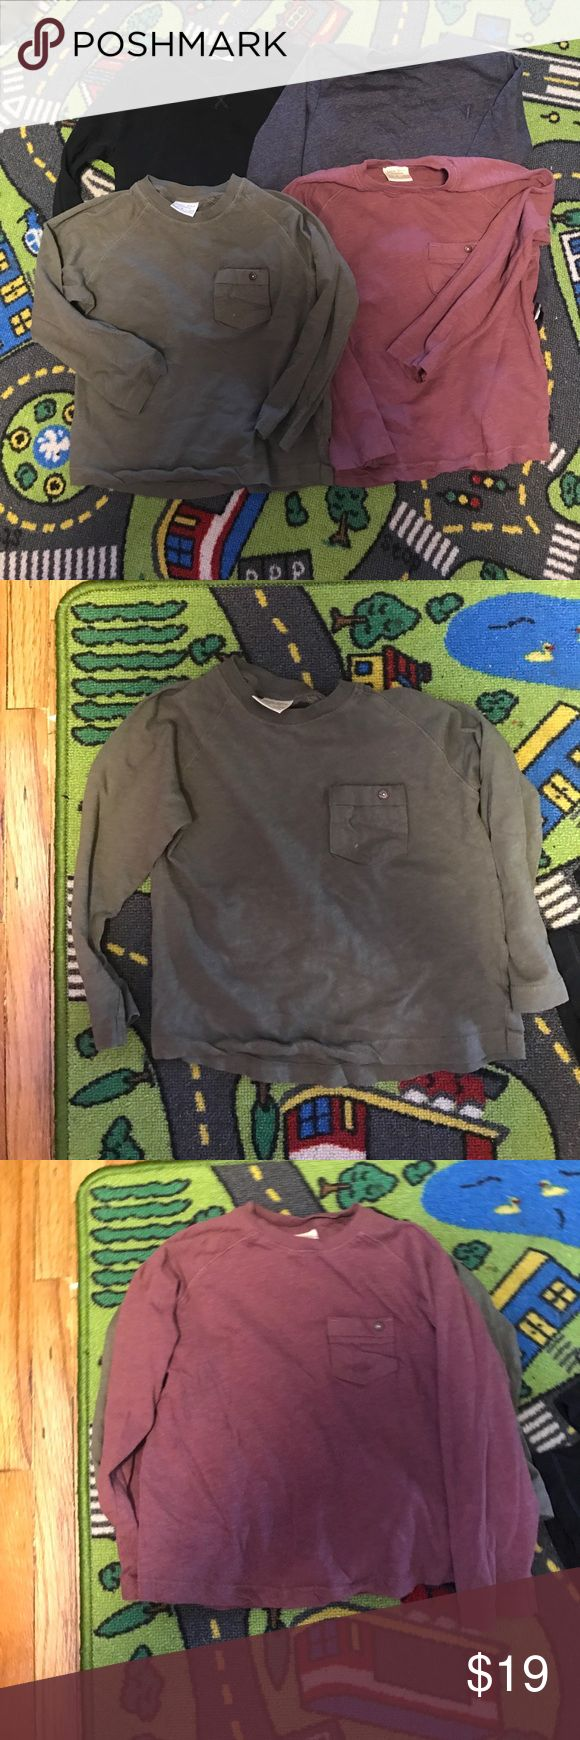 Bundle! 4 like new Zara boys tshirts Like New! 4 boys long sleeve Zara tshirts size 4 Zara Shirts & Tops Tees - Long Sleeve